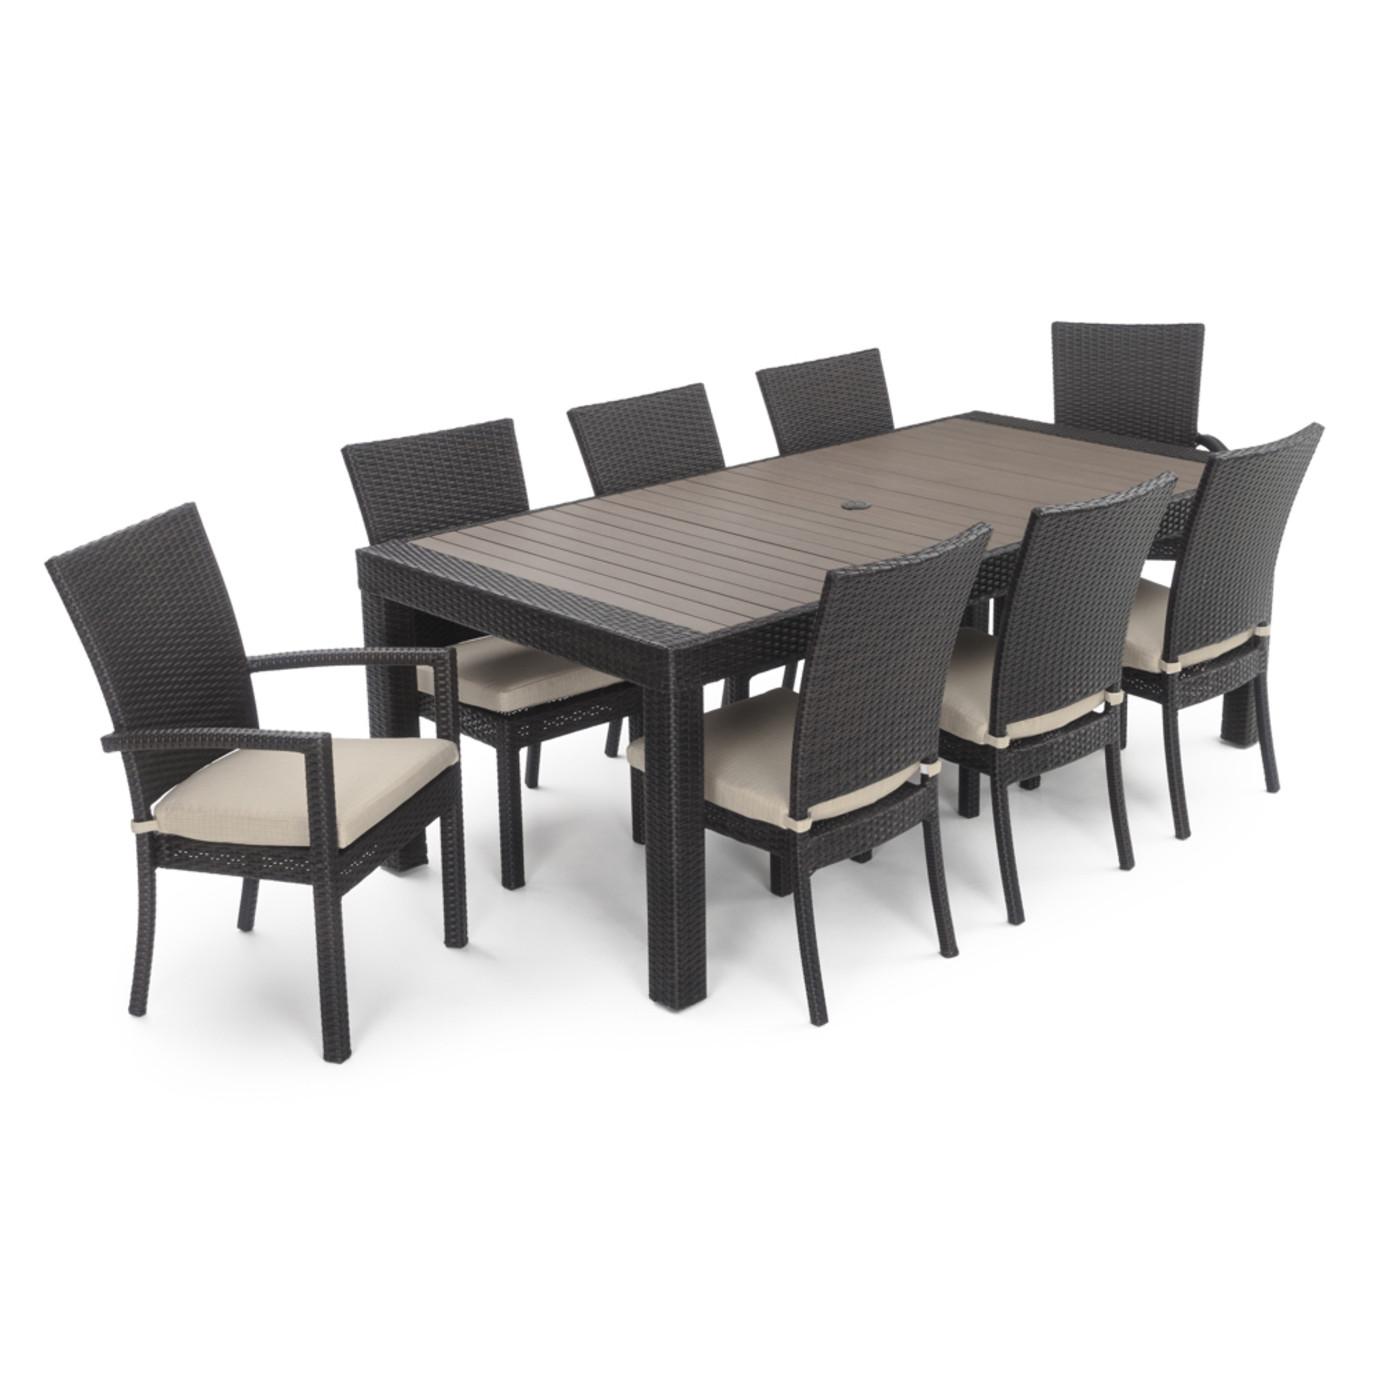 Deco™ 9pc Dining Set - Slate Grey